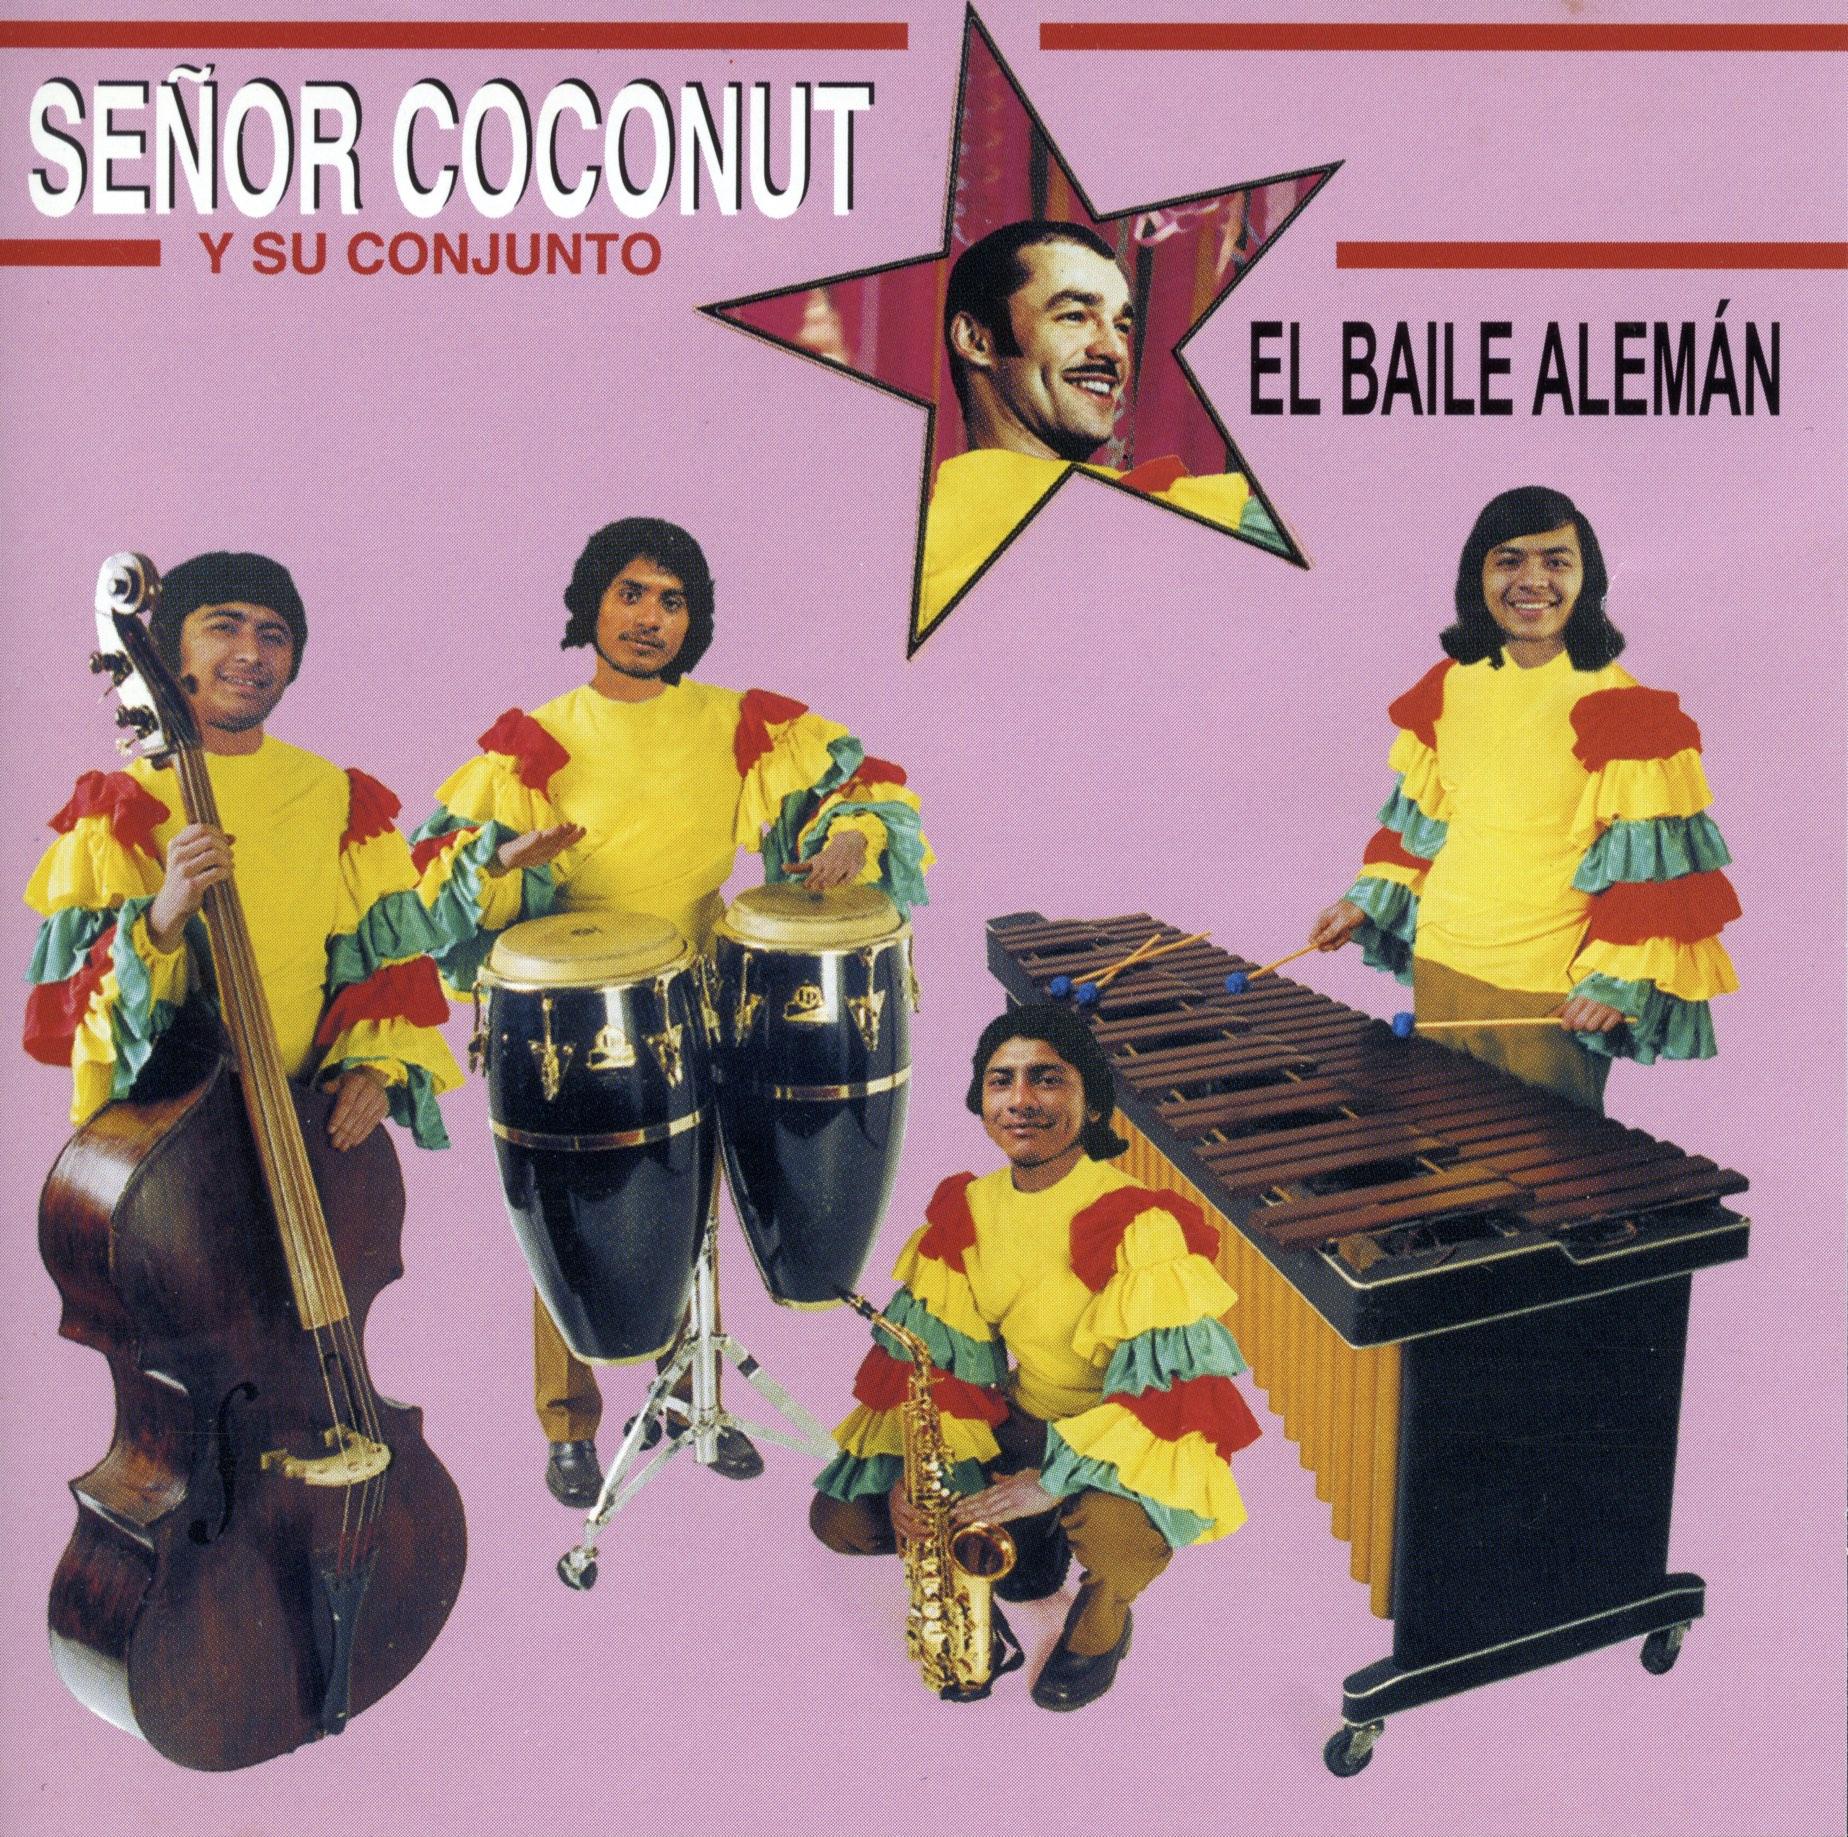 1999 - Senor Coconut